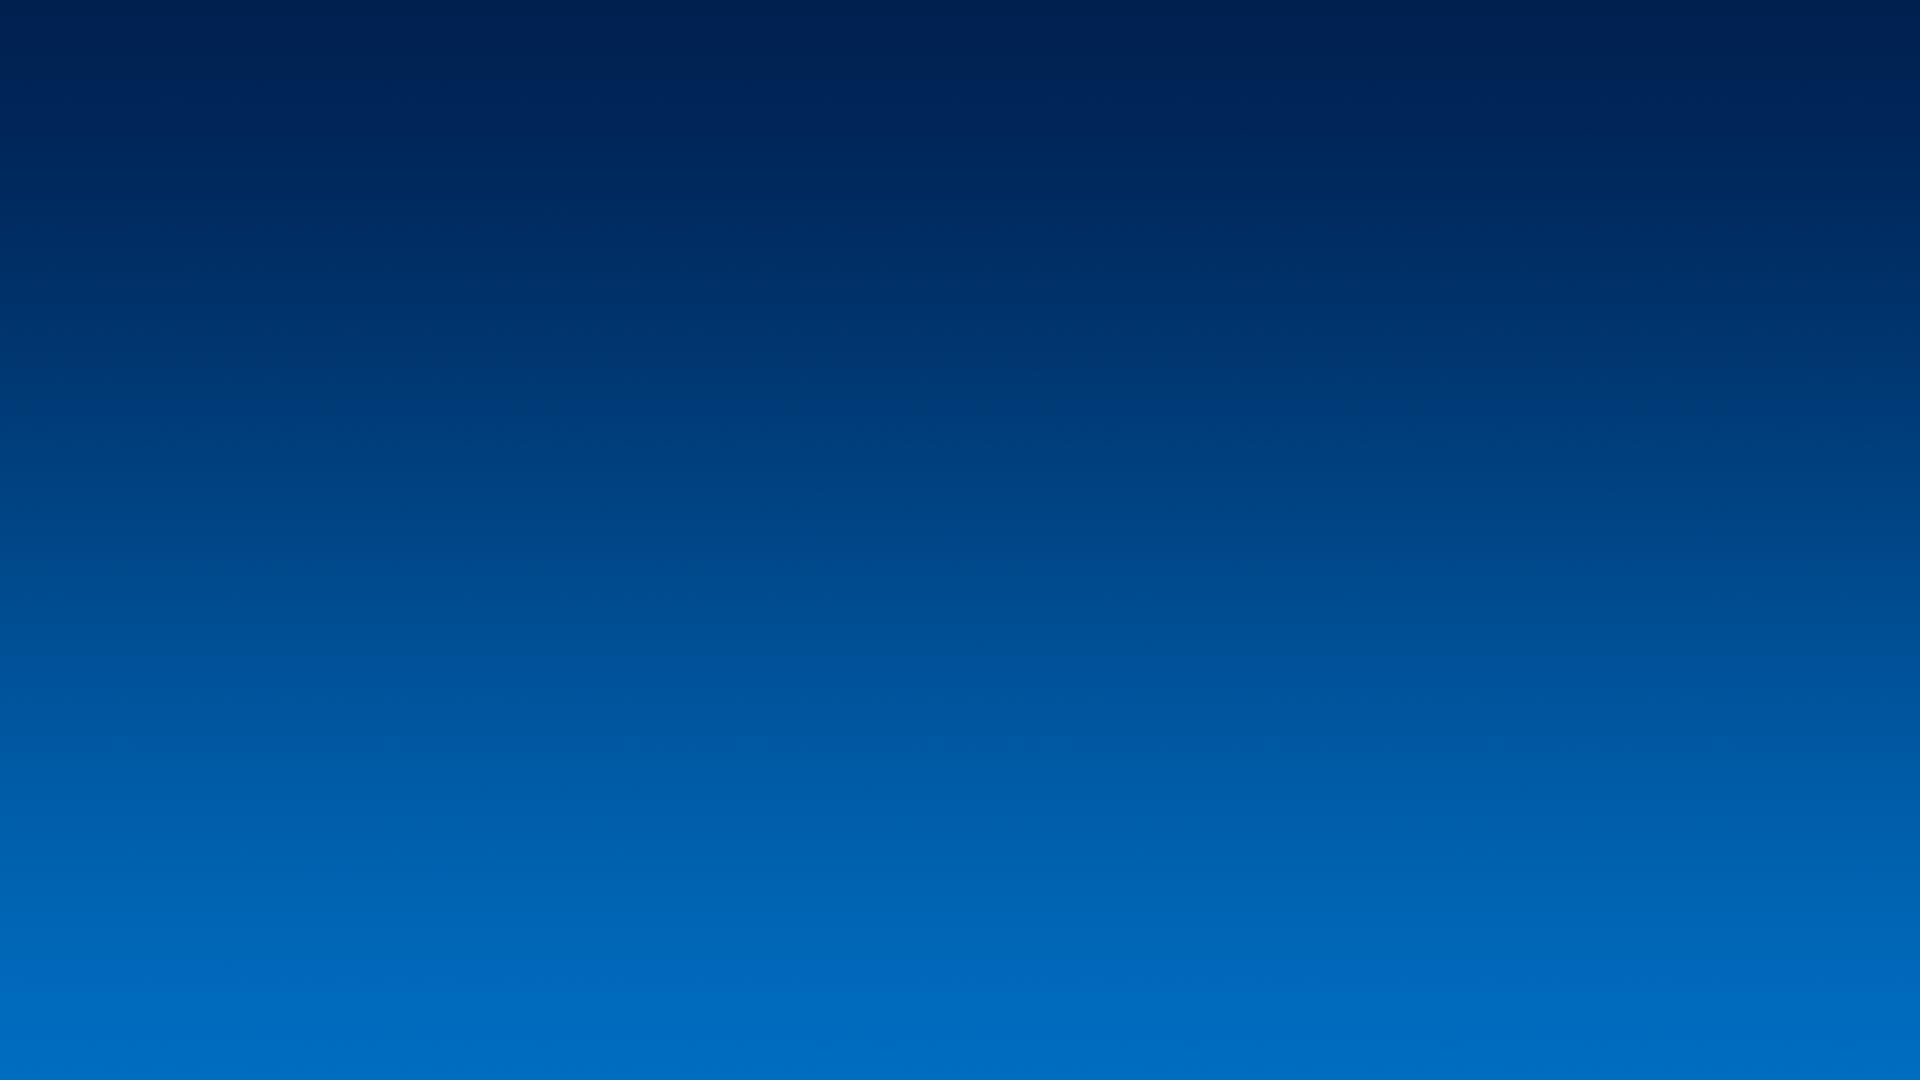 Windows 10 Preview Wallpaper iimgurcom 1920x1080